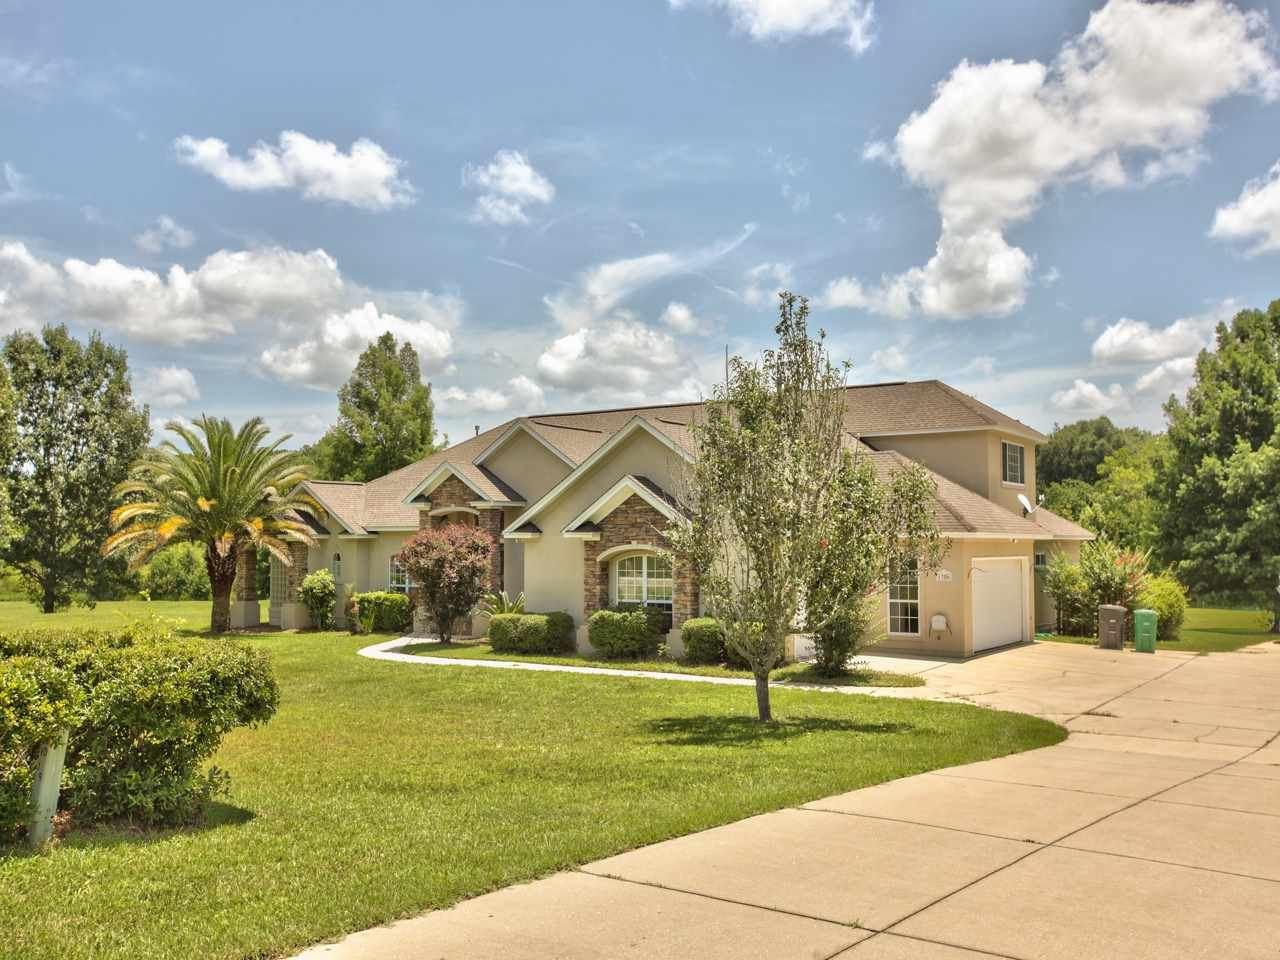 Photo of 1726 Vineyard Way, TALLAHASSEE, FL 32317 (MLS # 321886)